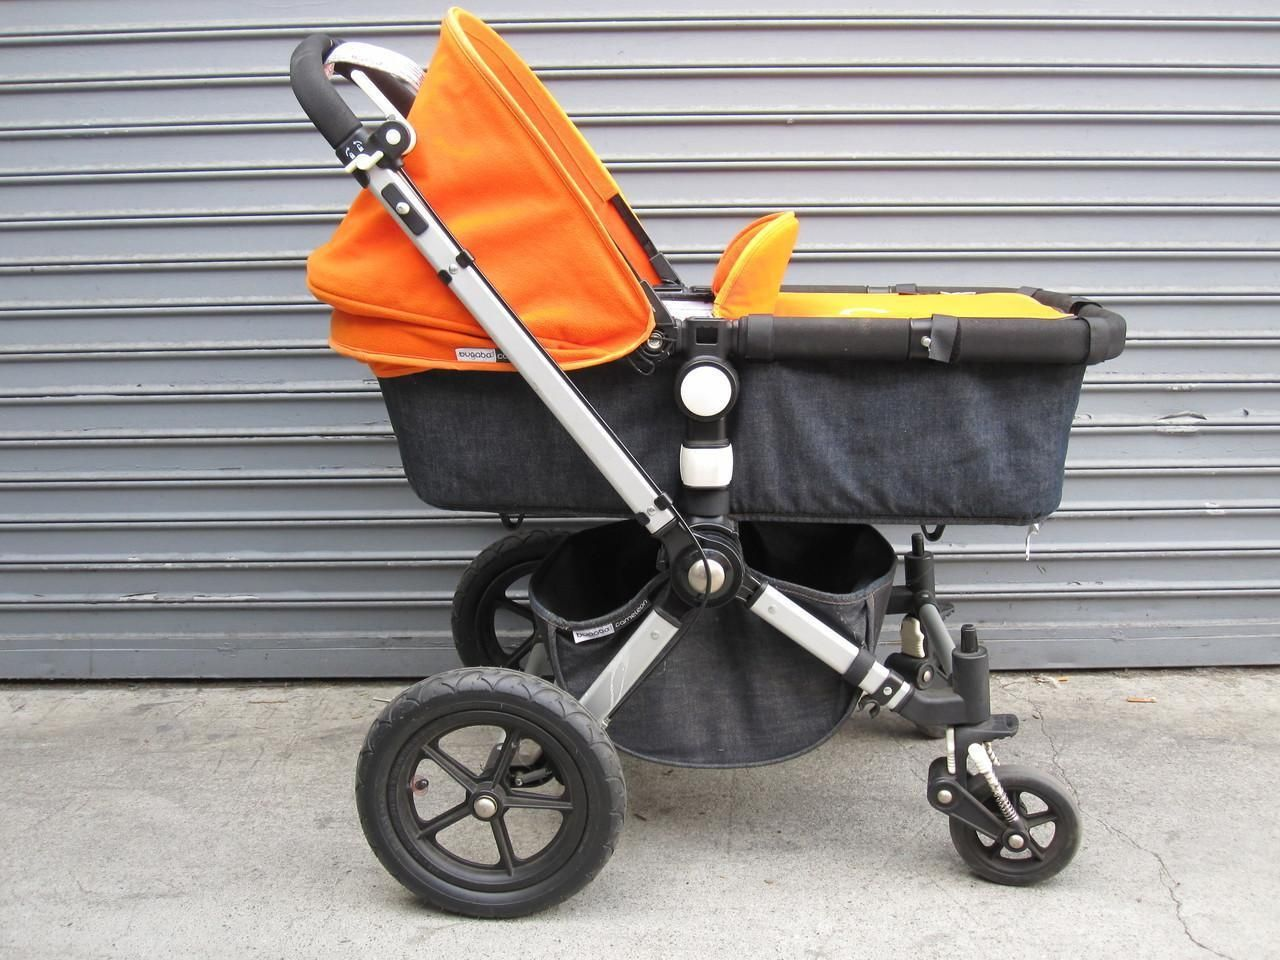 Bugaboo Special Edition Denim 007 Stroller (Tangerine